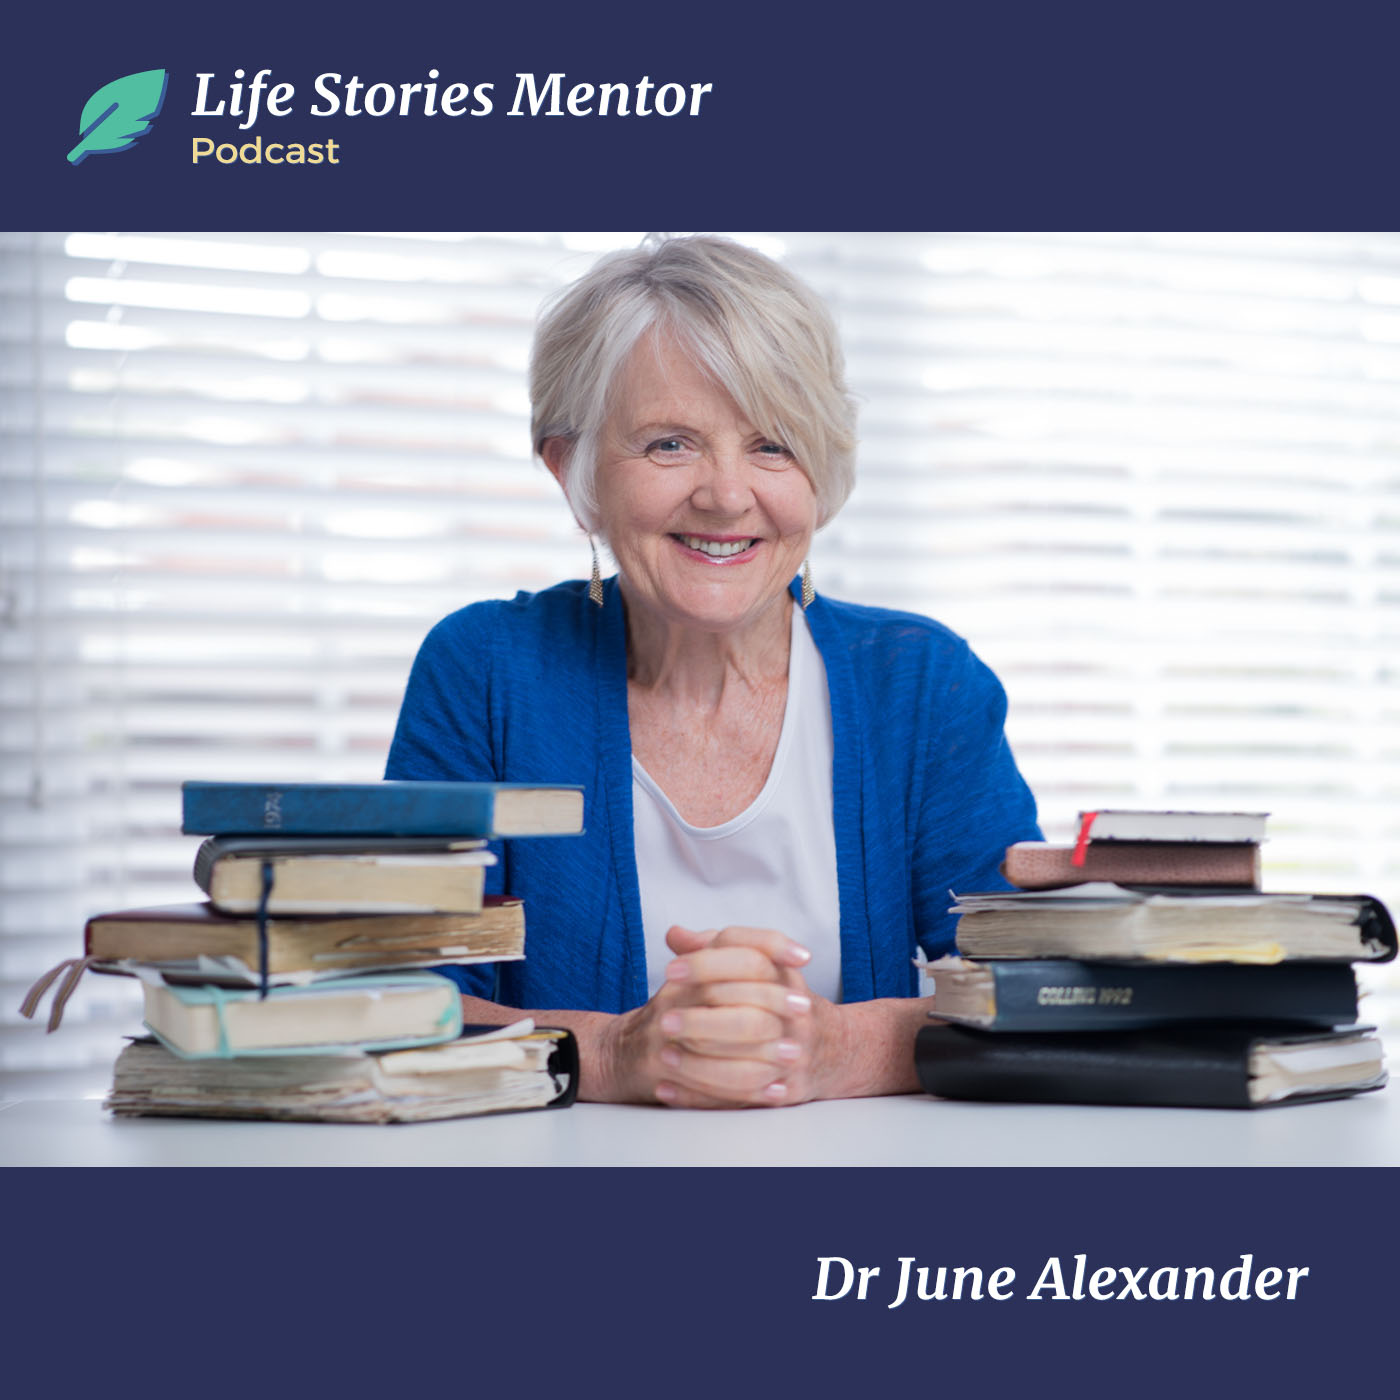 Life Stories Mentor